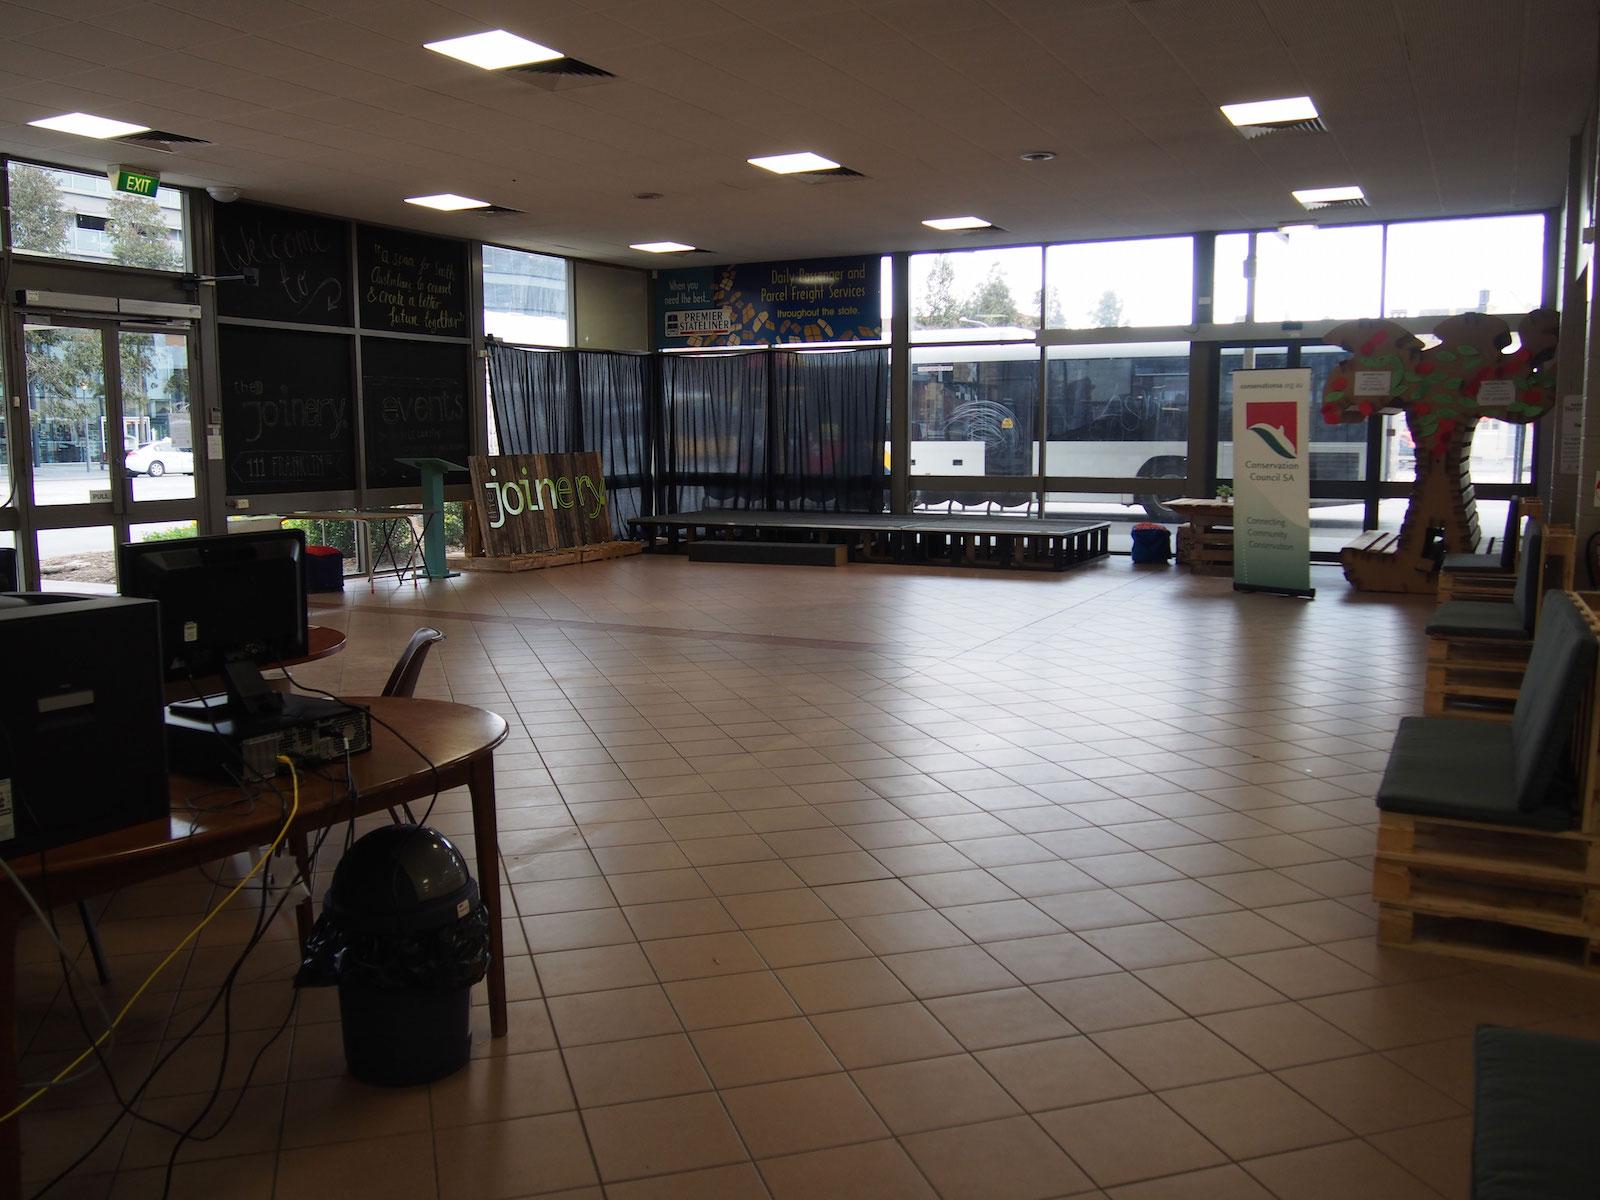 Exhibition-Hall.jpg